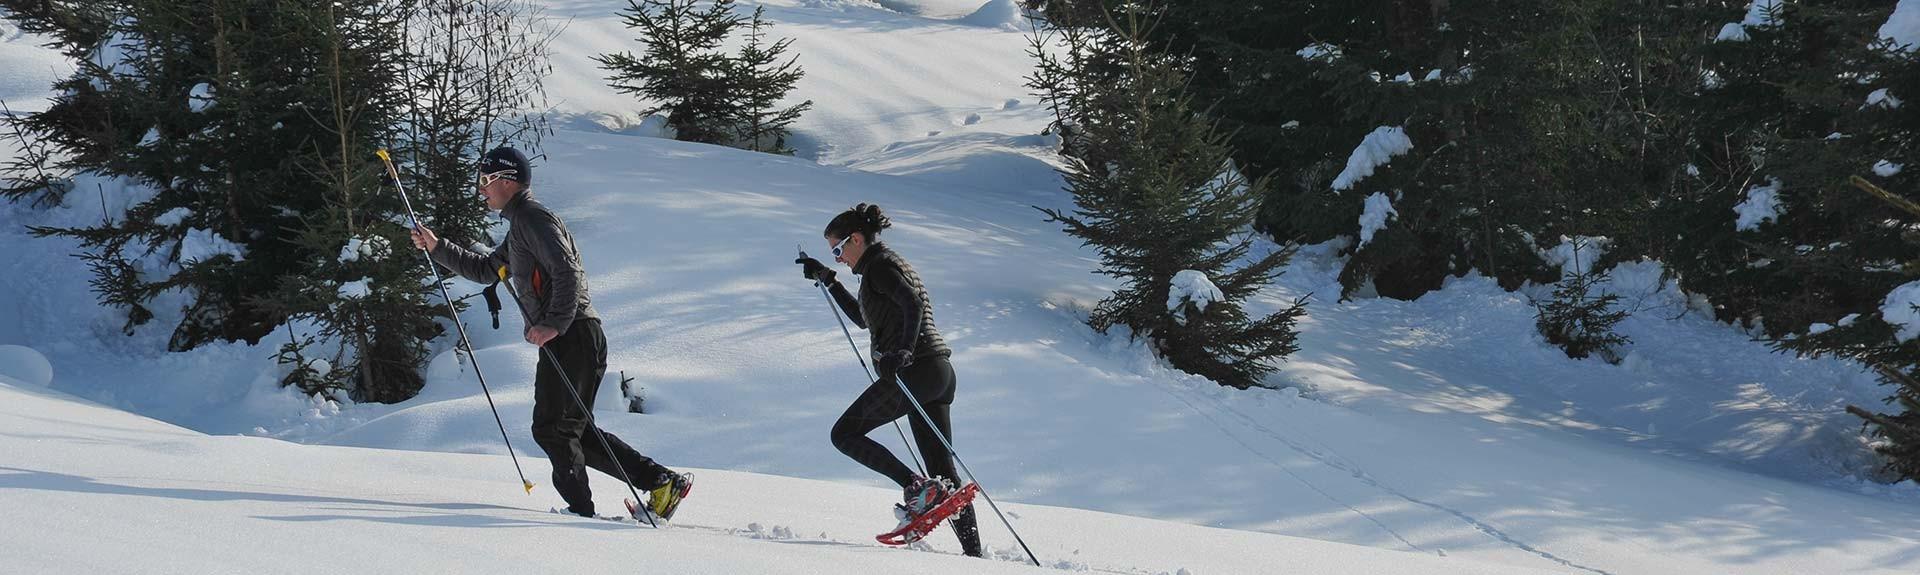 Wandelen, Sneeuwschoenen